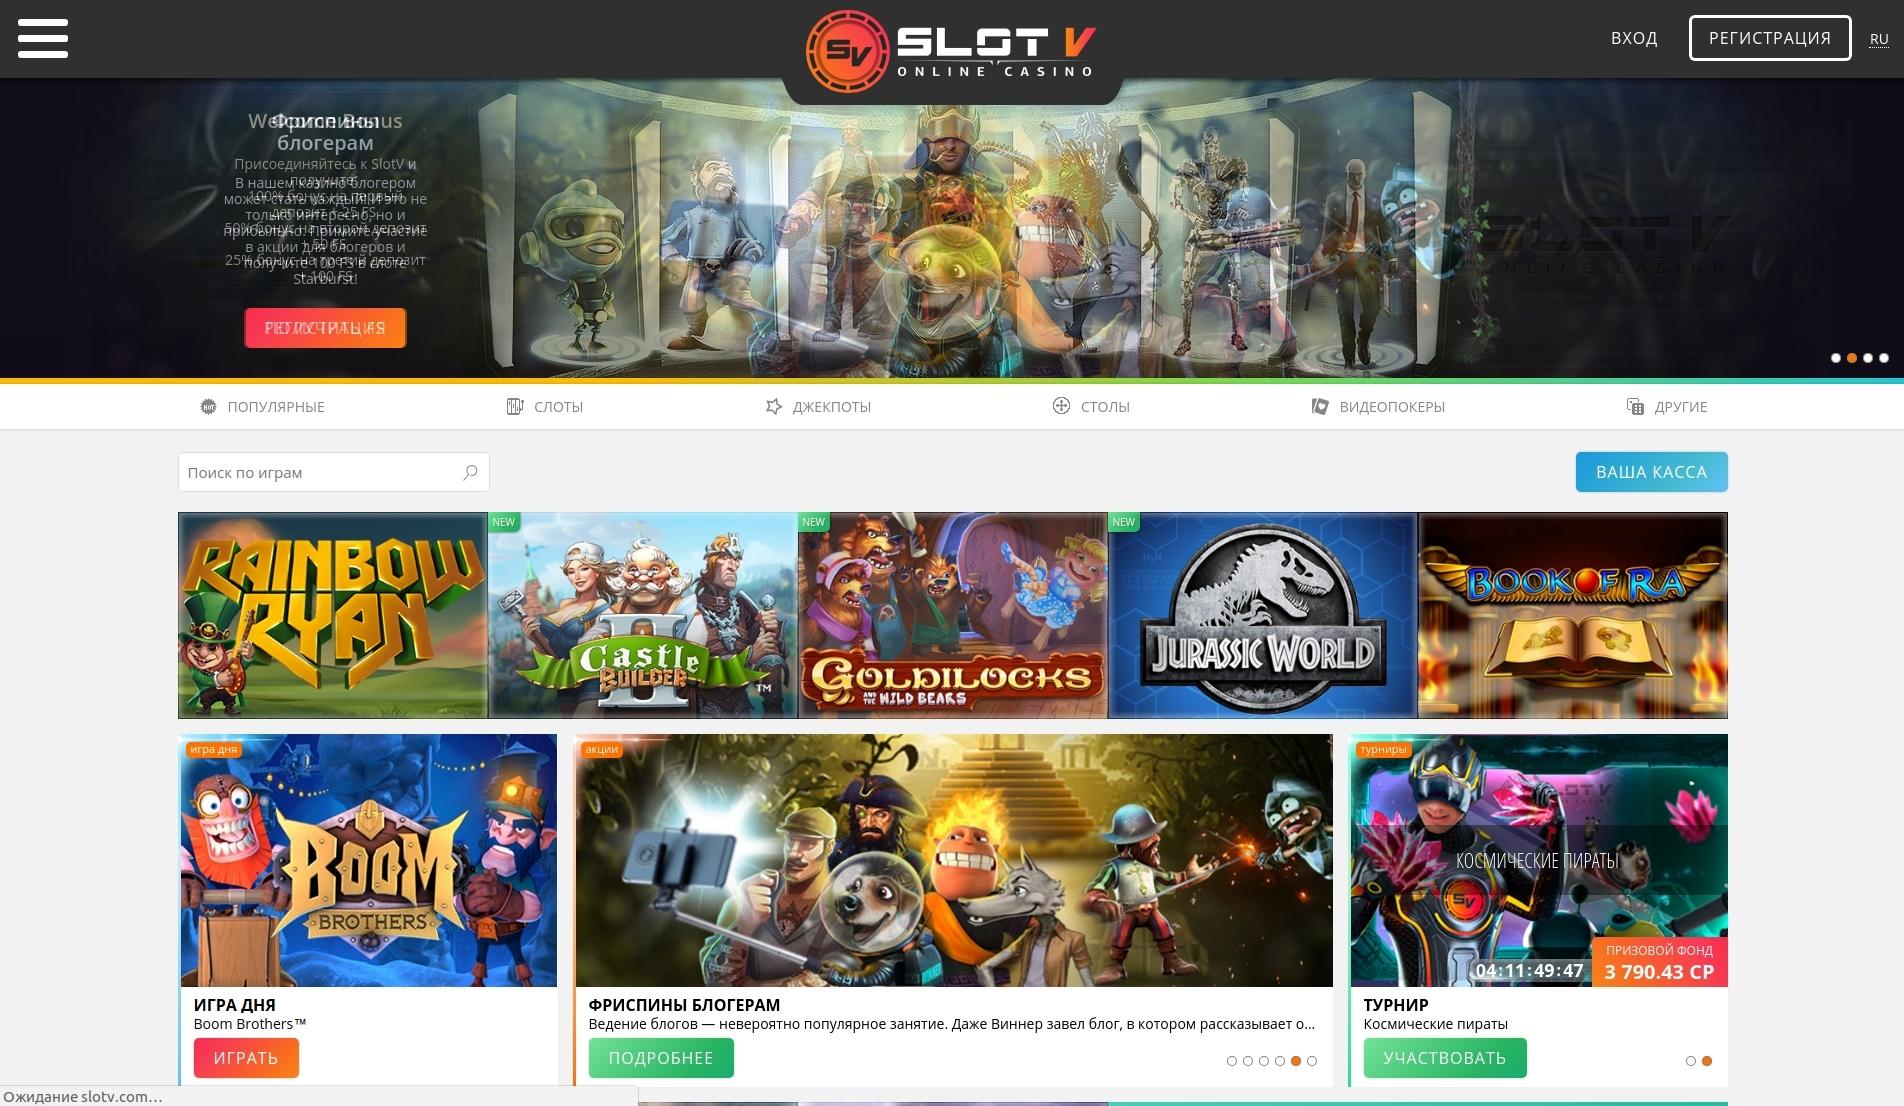 slot v casino официальный сайт вход